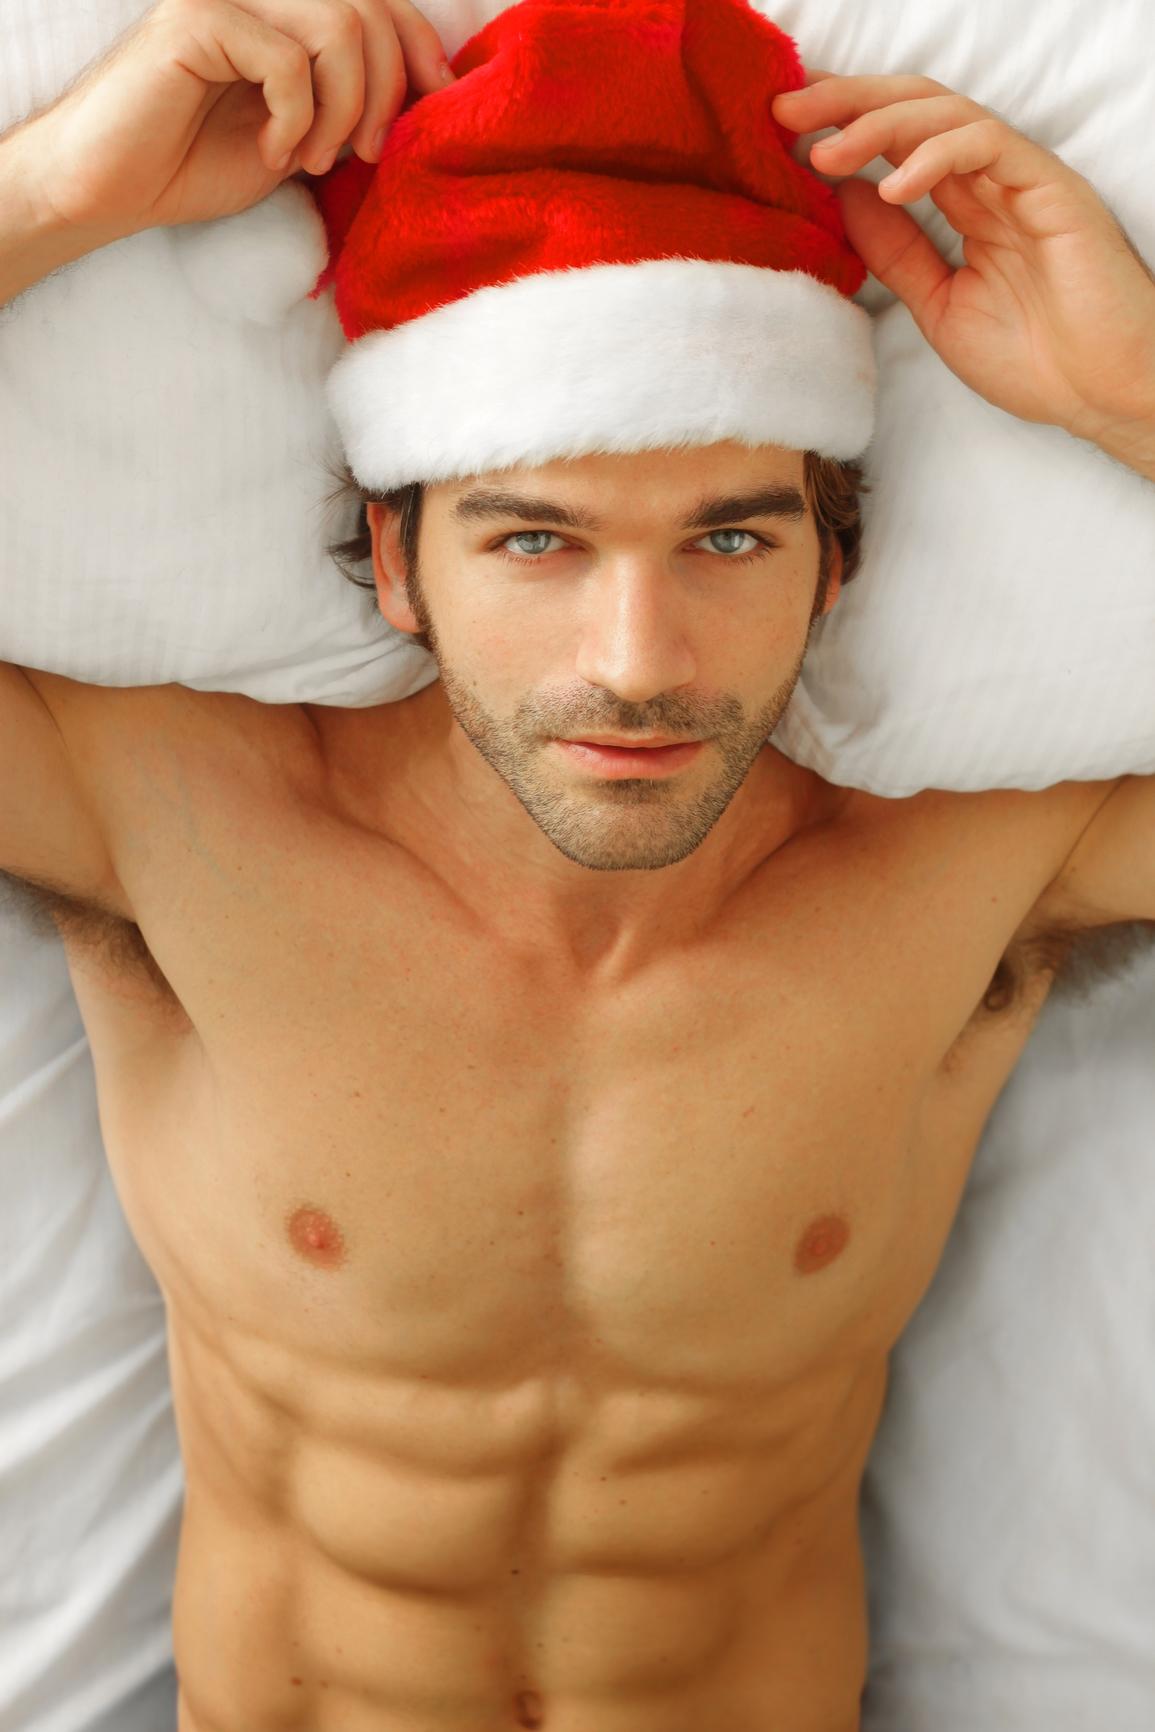 Guys naked with santa hats #4